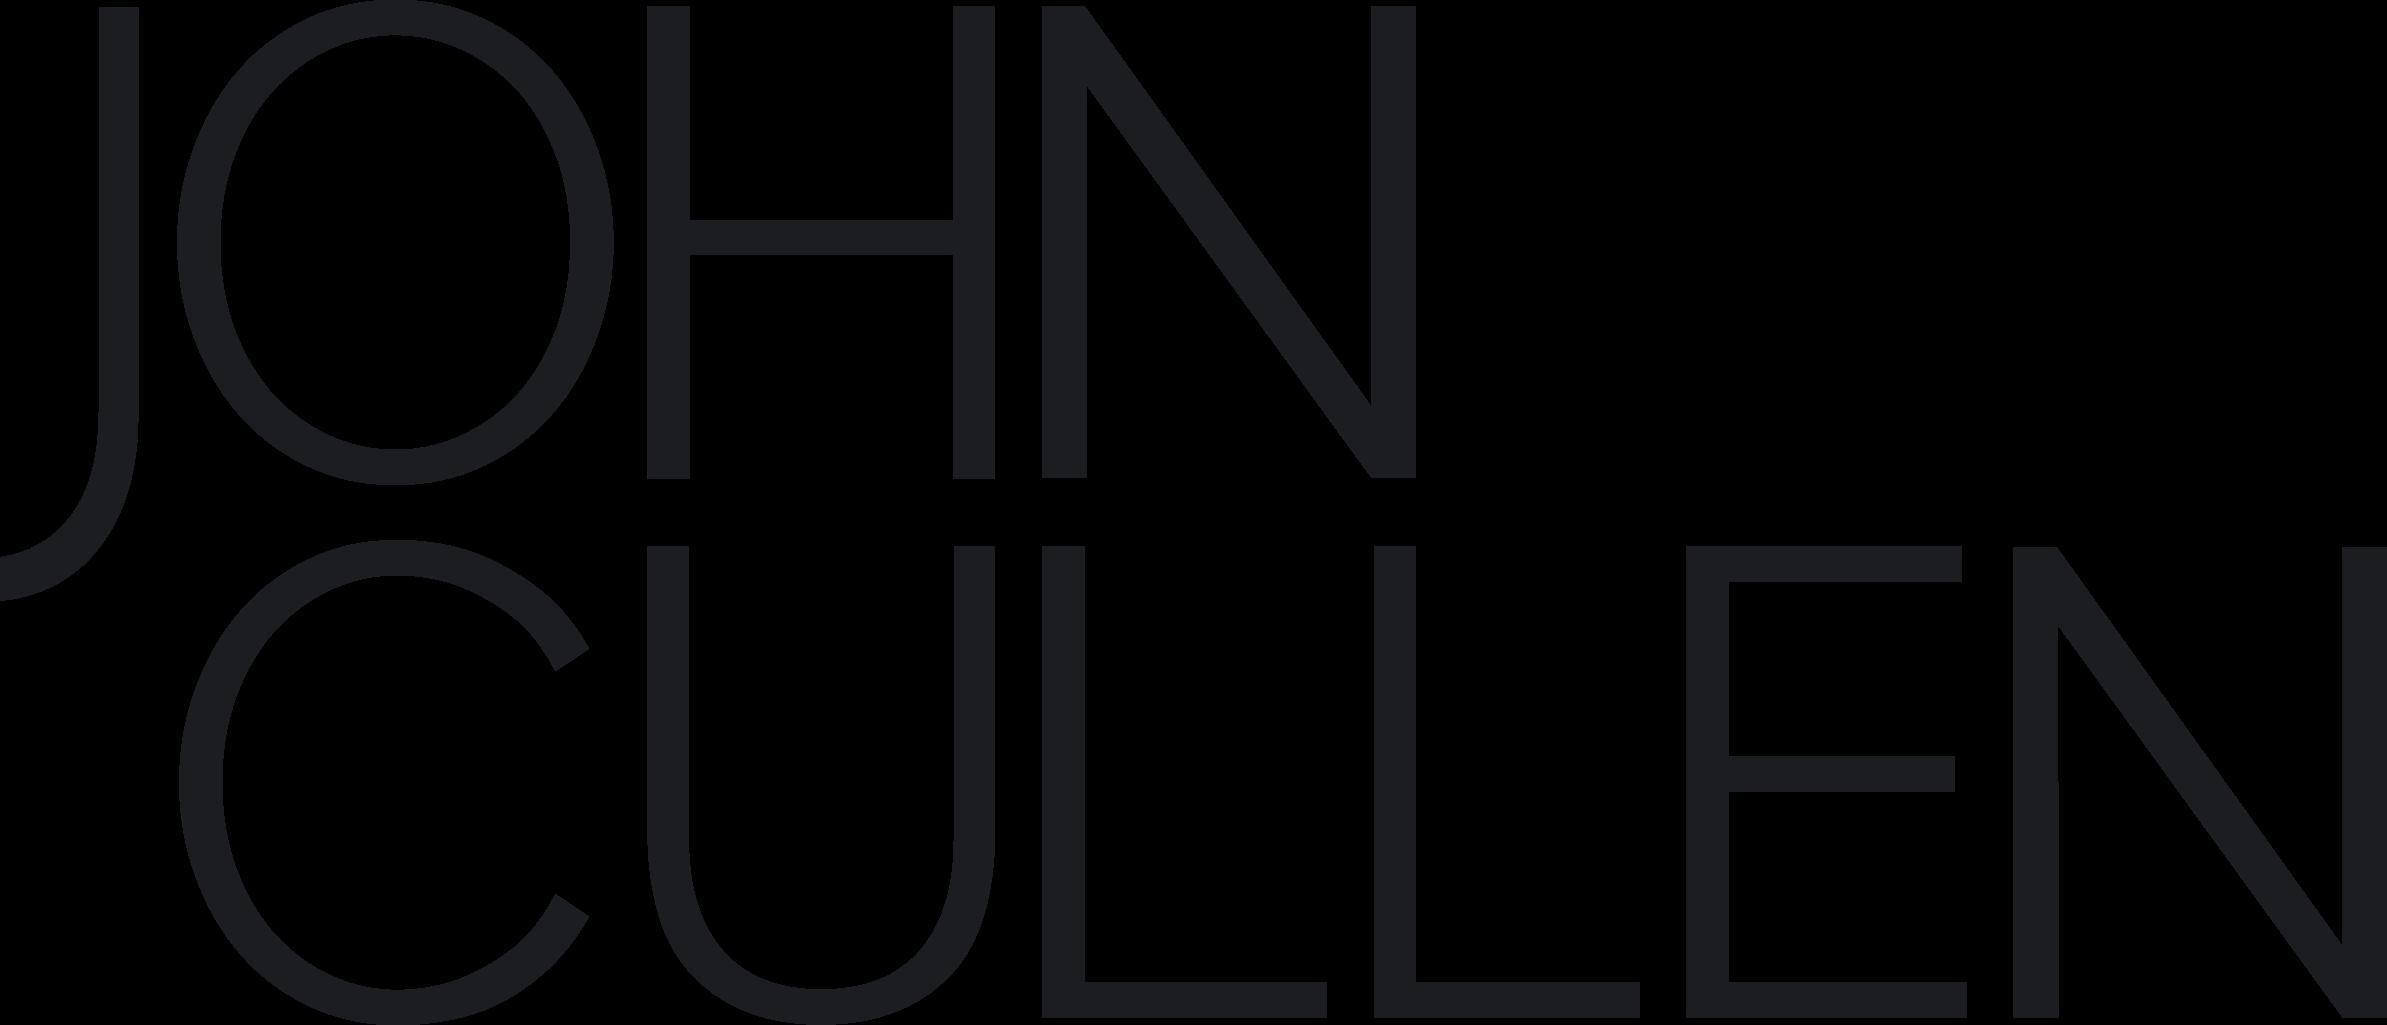 Award-winning architectural lighting specialist   John Cullen Lighting